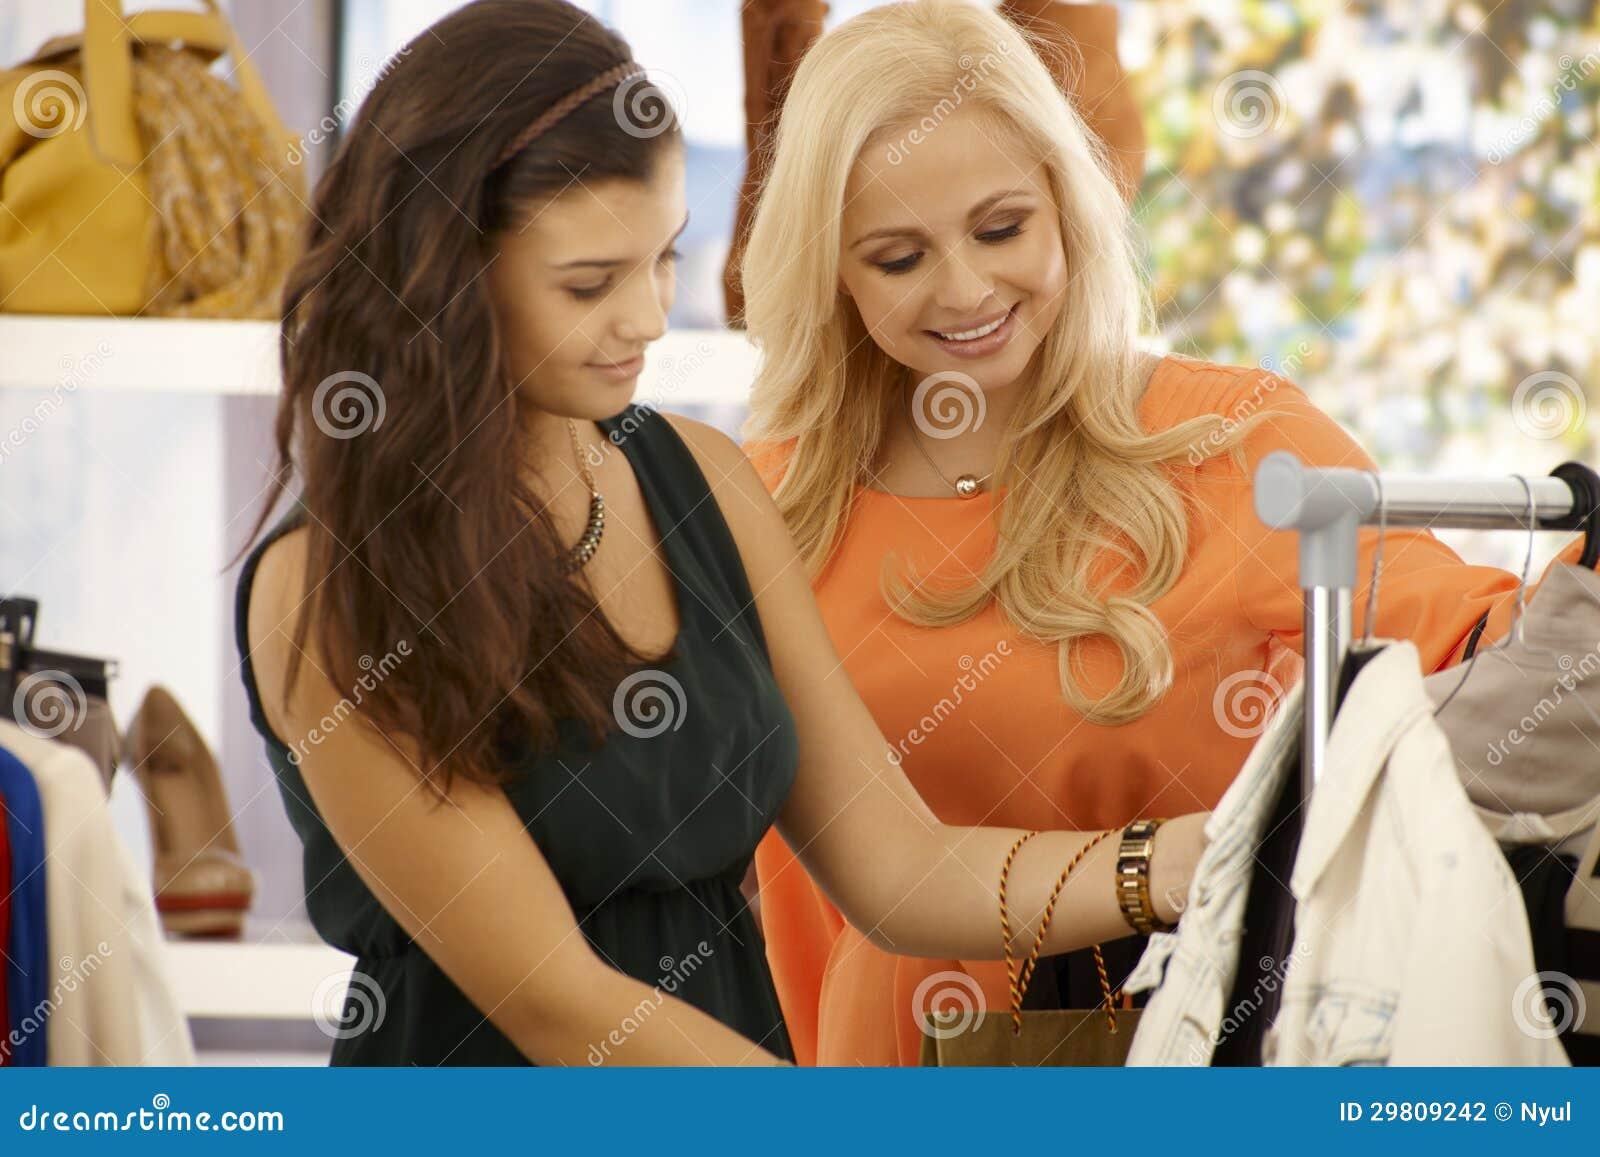 lolly-pretty-girls-store-caseras-secret